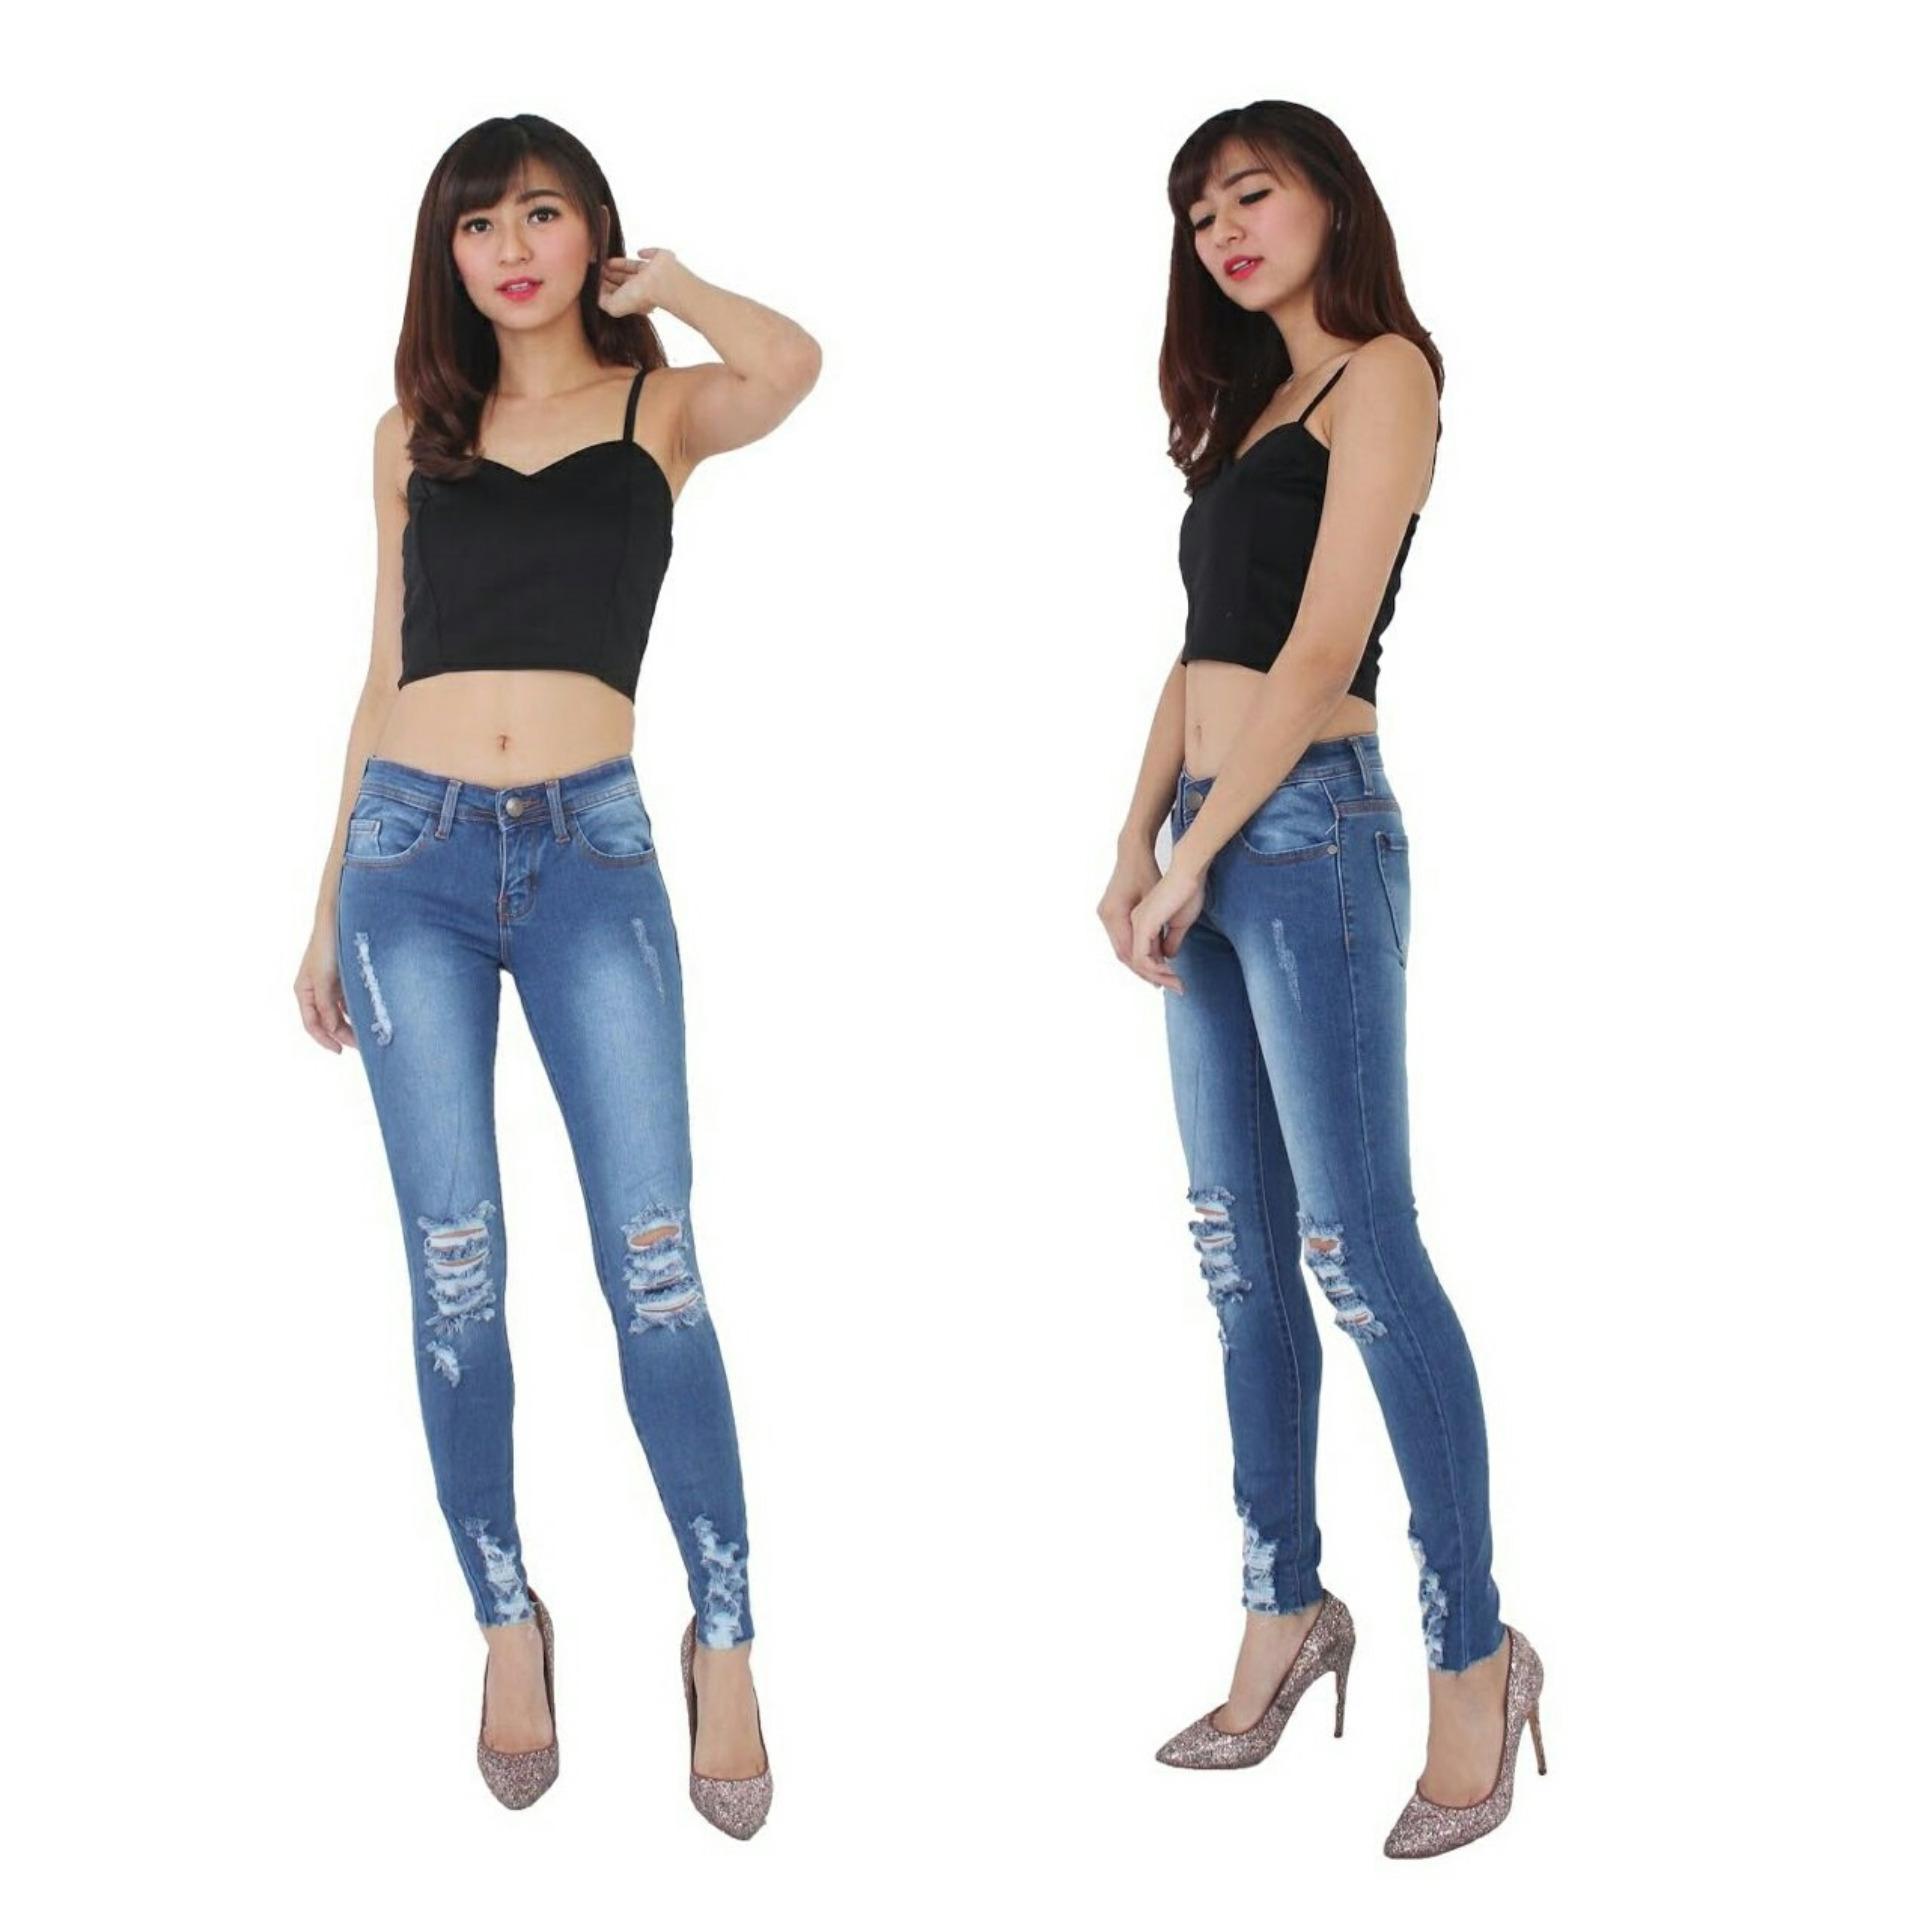 Jual Amazara Evelyn White Sneakers Harga Rp 273000 Putih 40 Celana Jeans Wanita Fashionable Good Quality Ripped